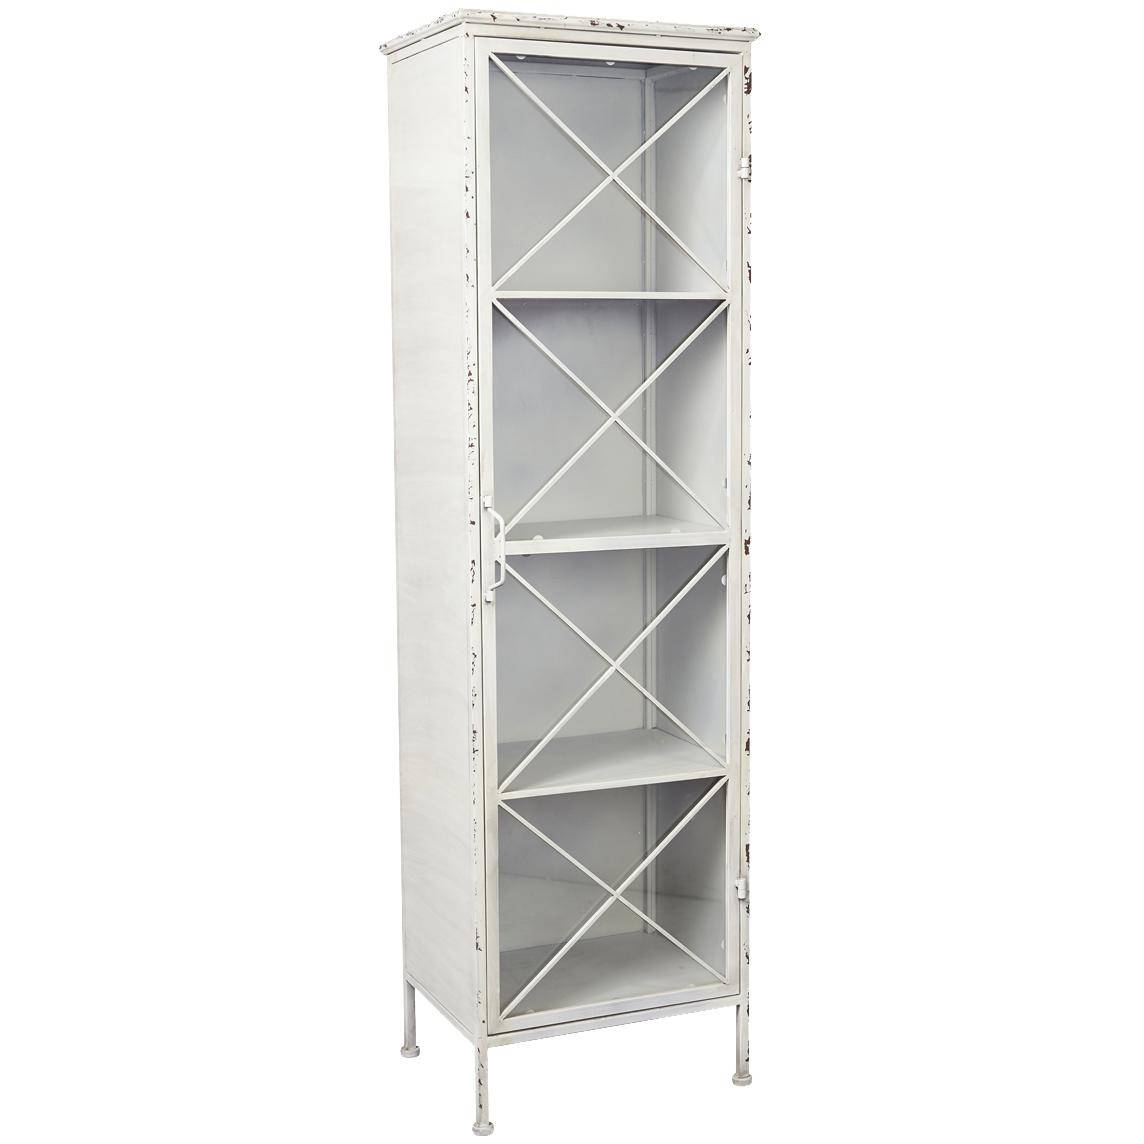 Antique White Single Door Metal Bookcase